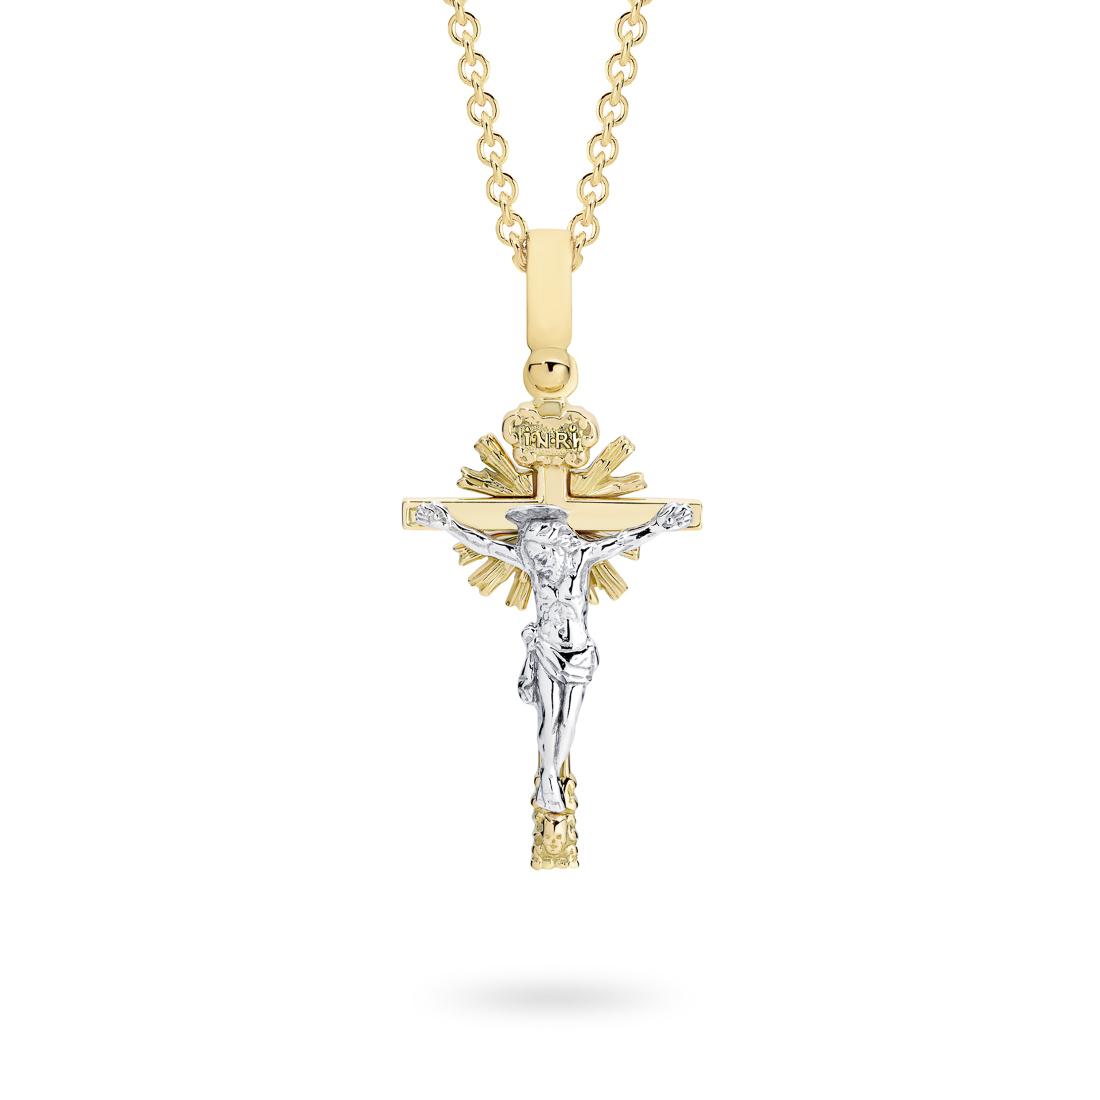 18K Yellow & White Gold Shinning Star Crucifix Pendant